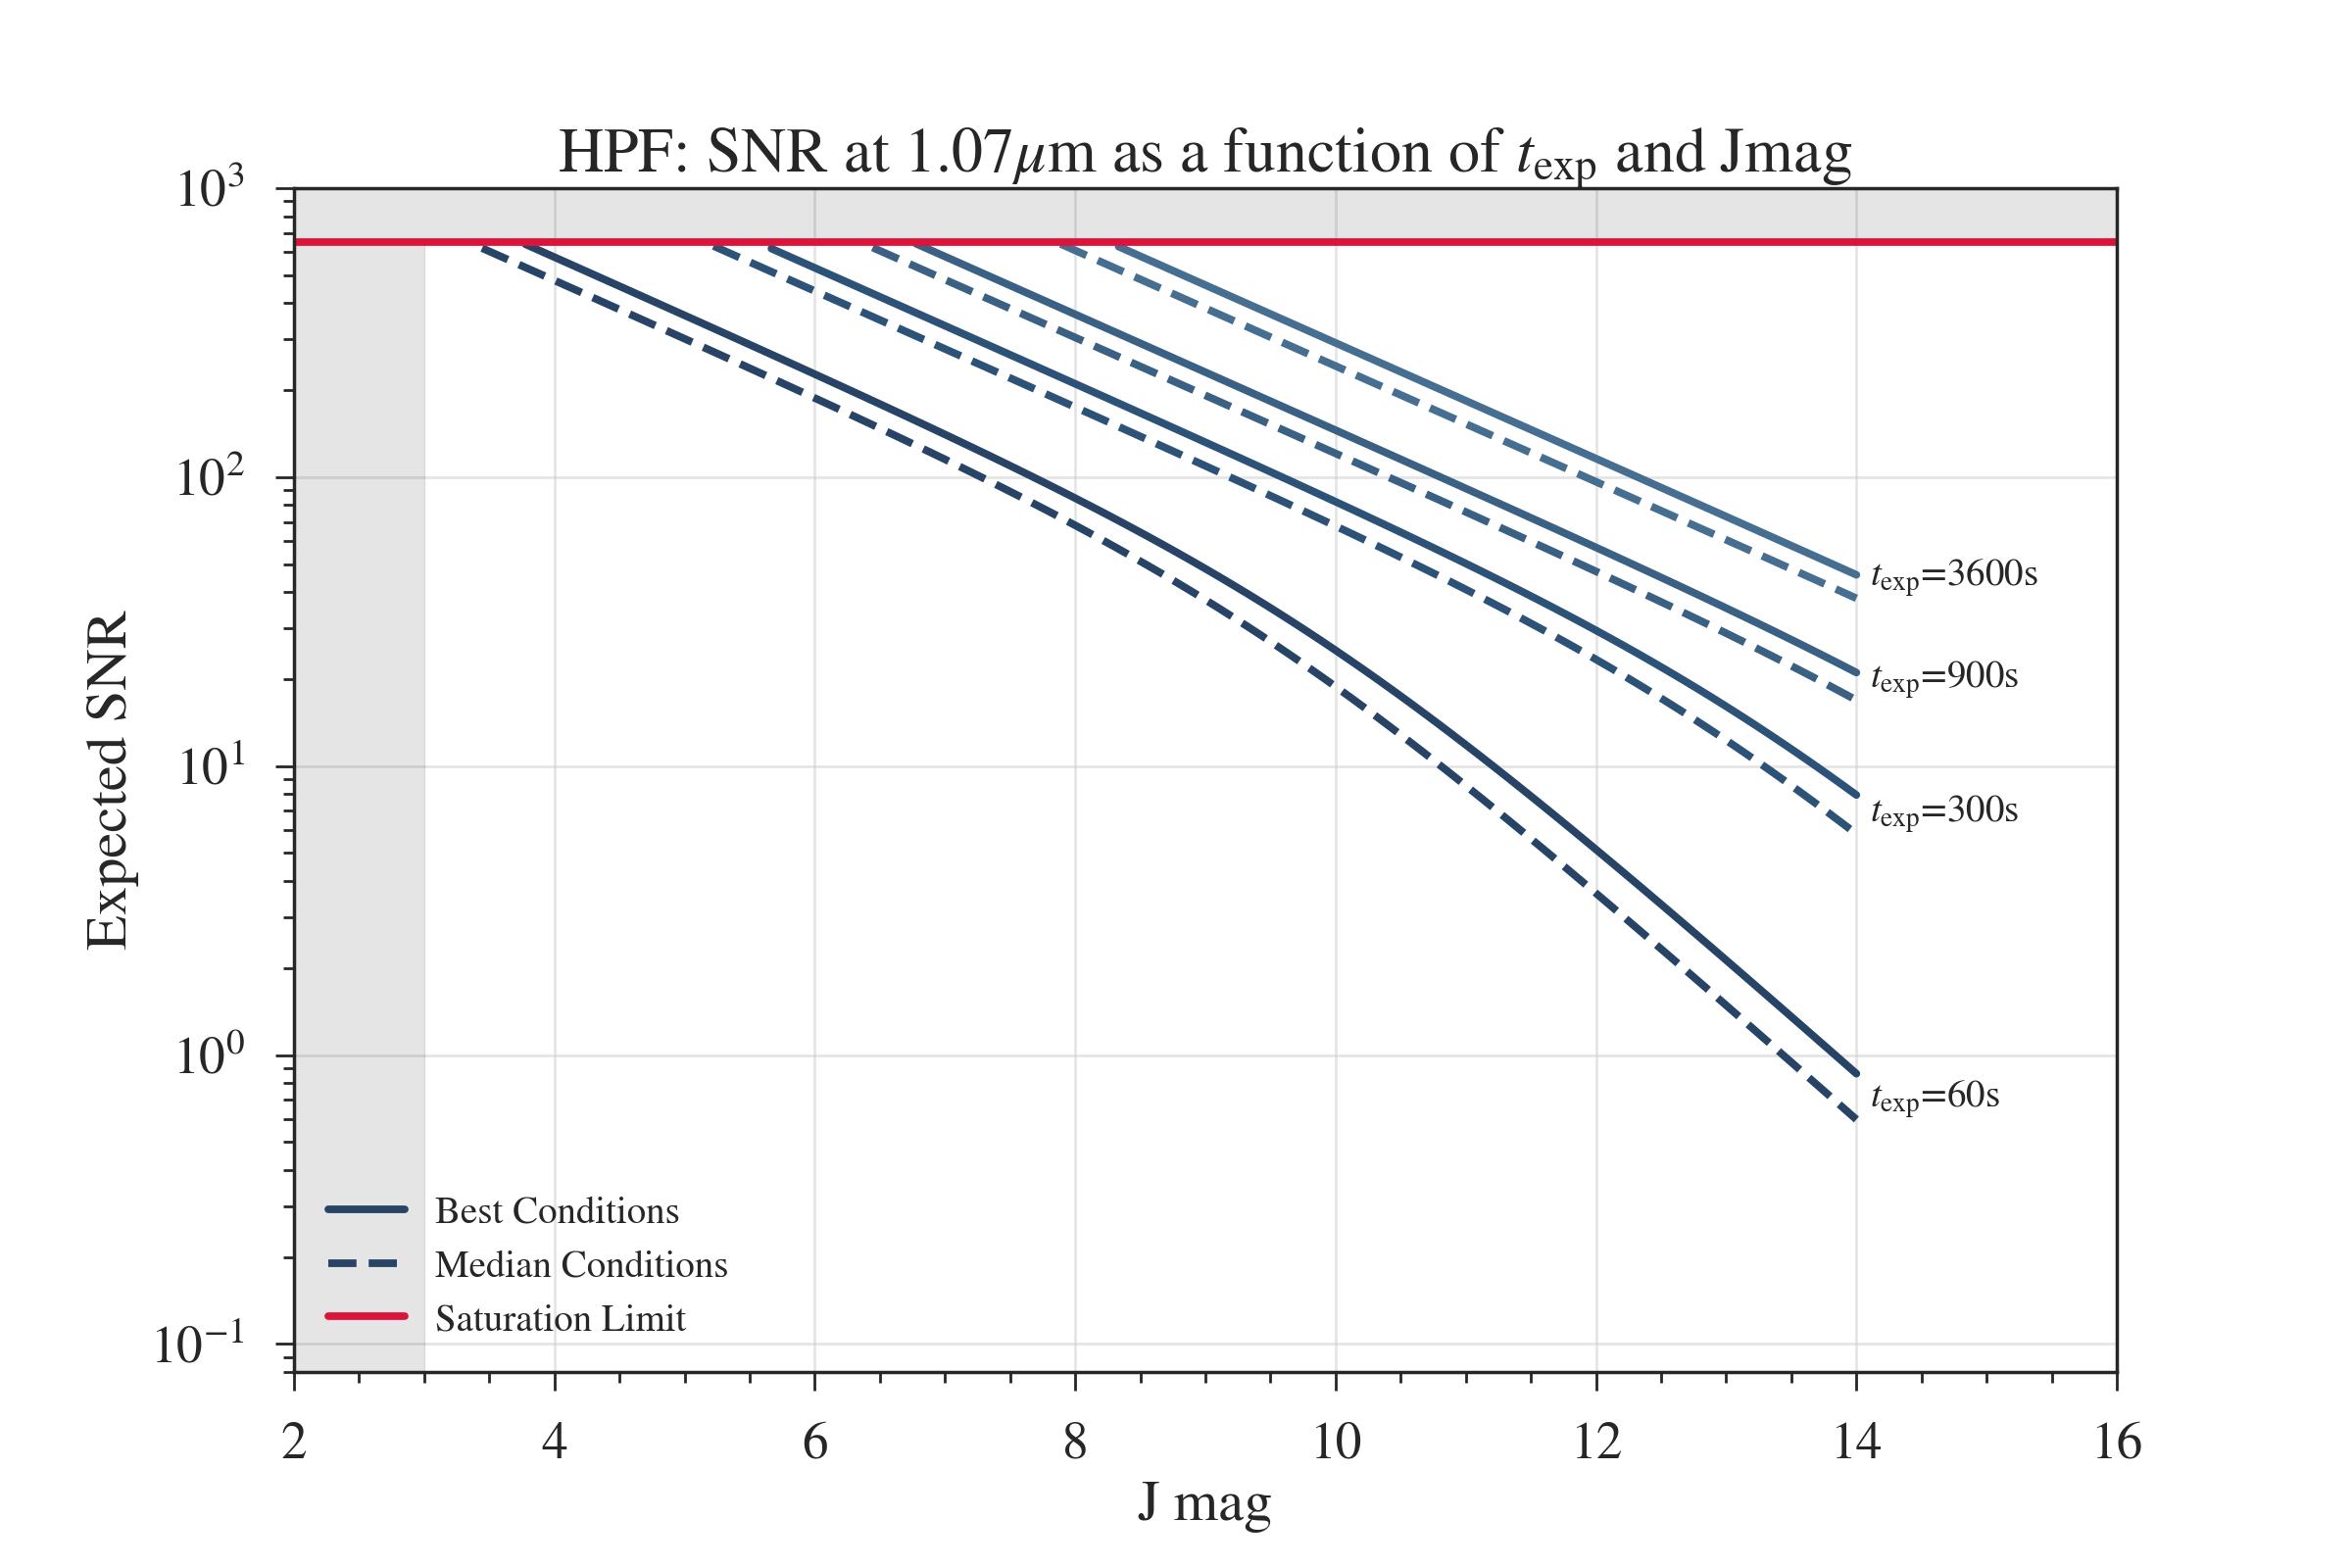 Exposure Time - HPF